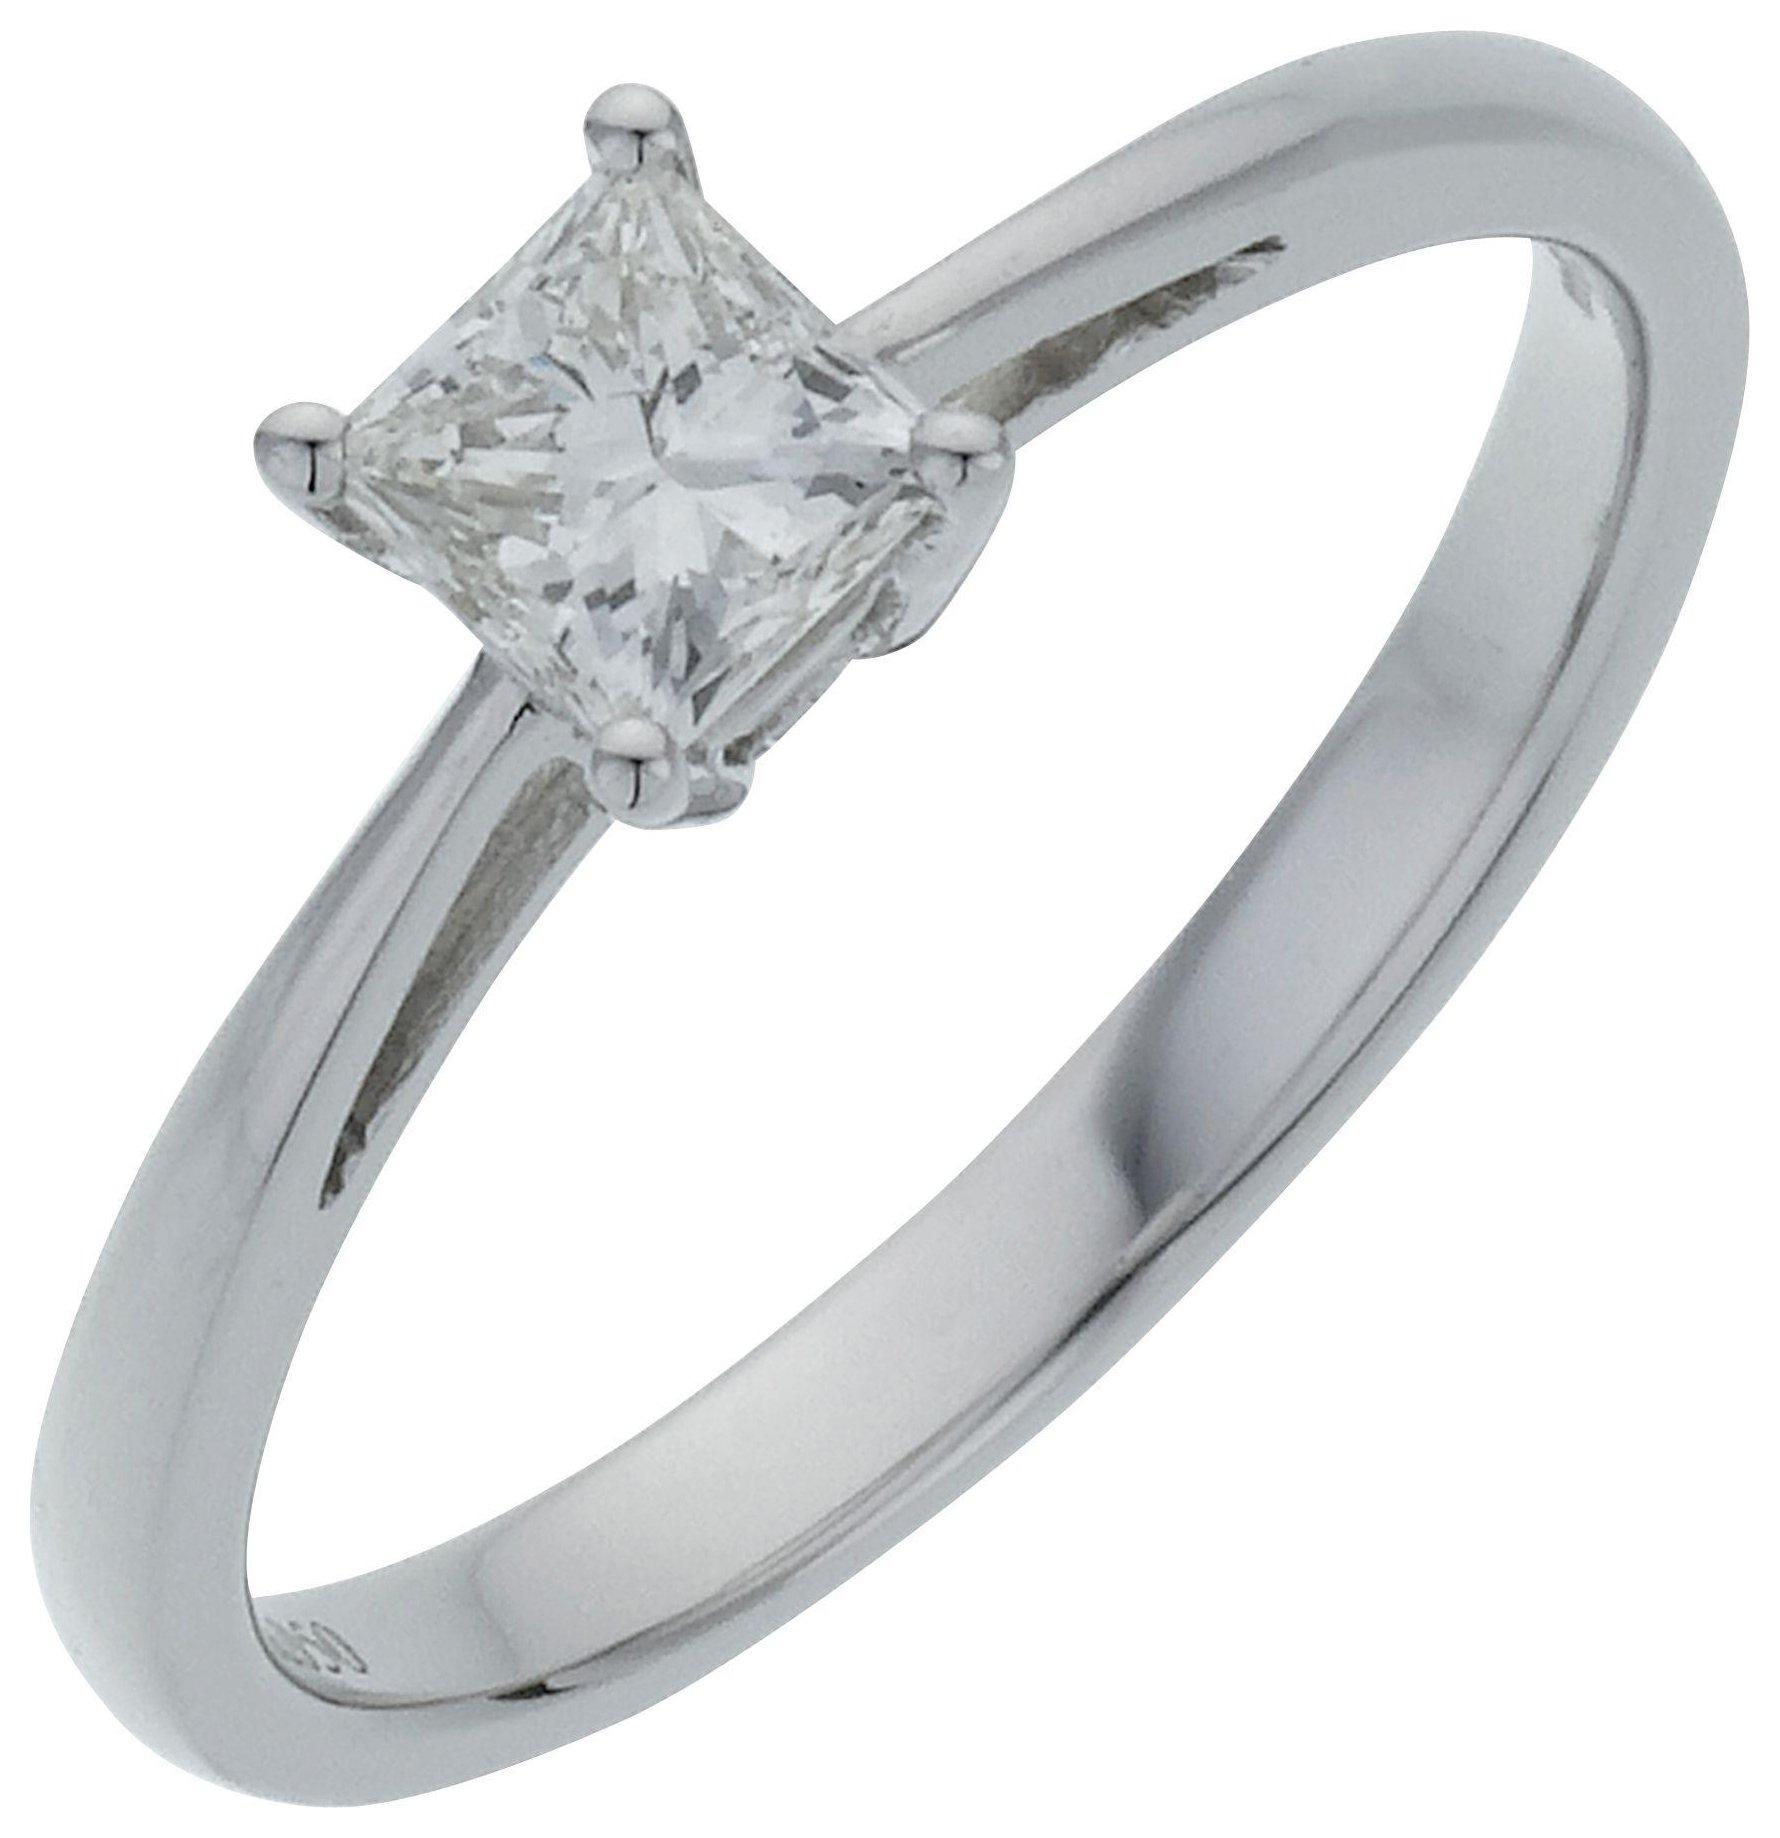 18 Carat White Gold 05 Carat Diamond - Princess Cut Diamond - Ring - R